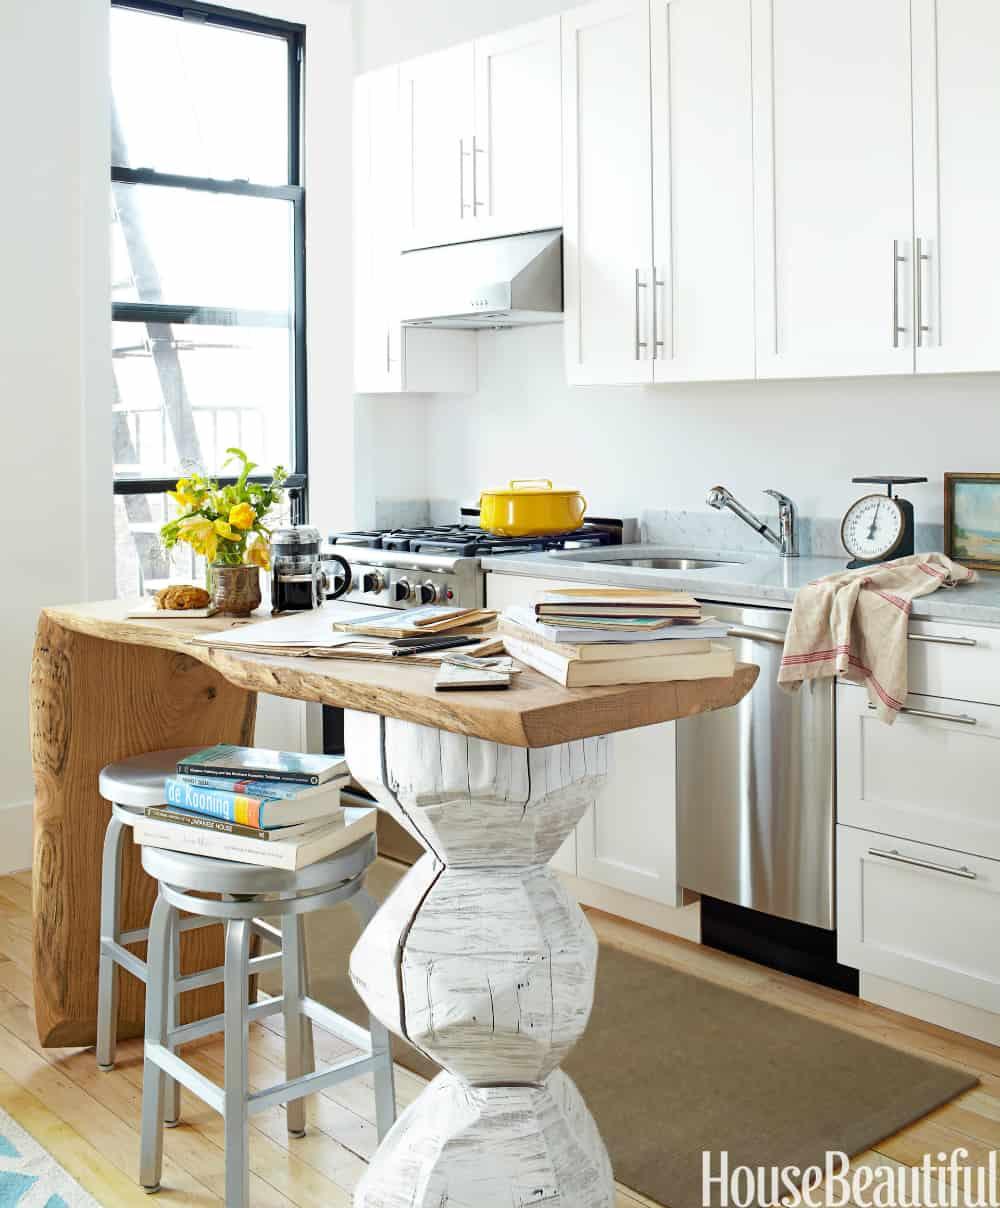 Amazingly unique kitchen island